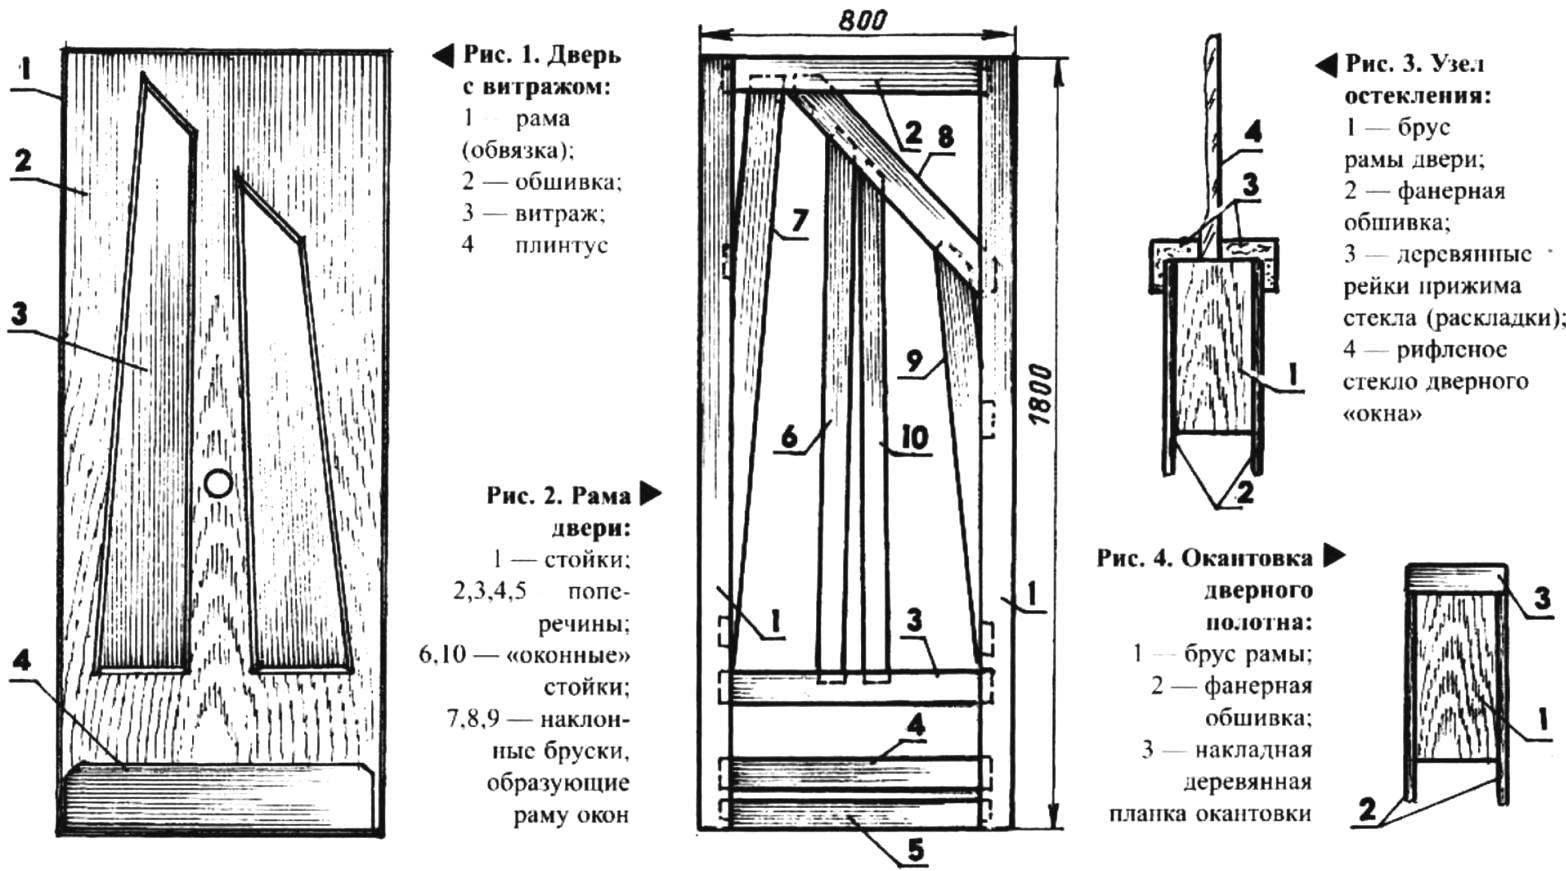 DOOR-STAINED GLASS